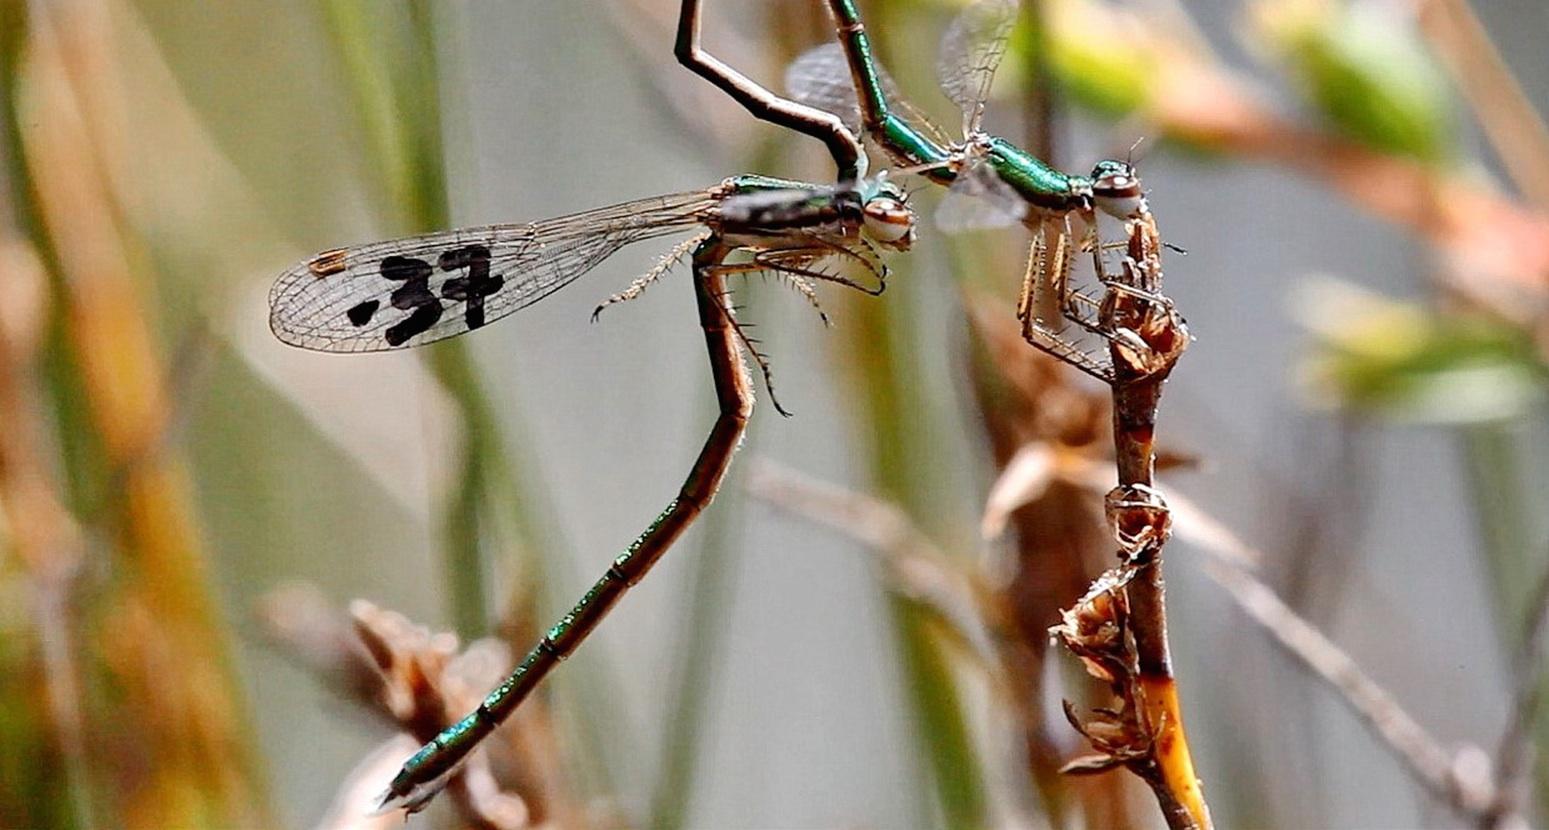 Intra-male sperm translocation behavior